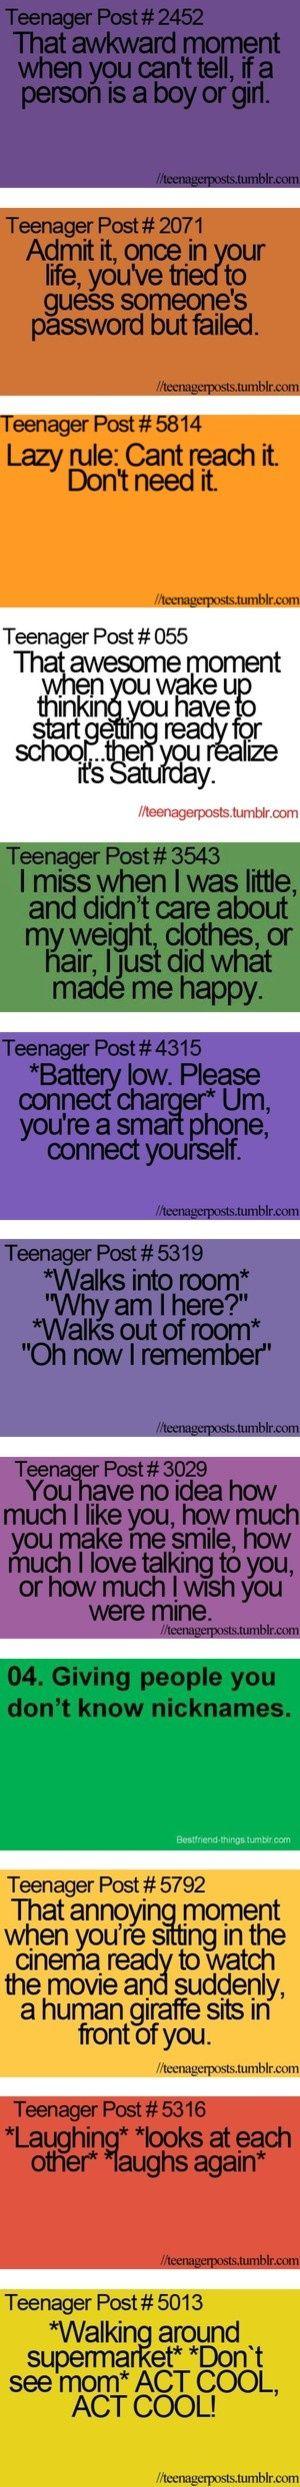 Funny Teenager Post